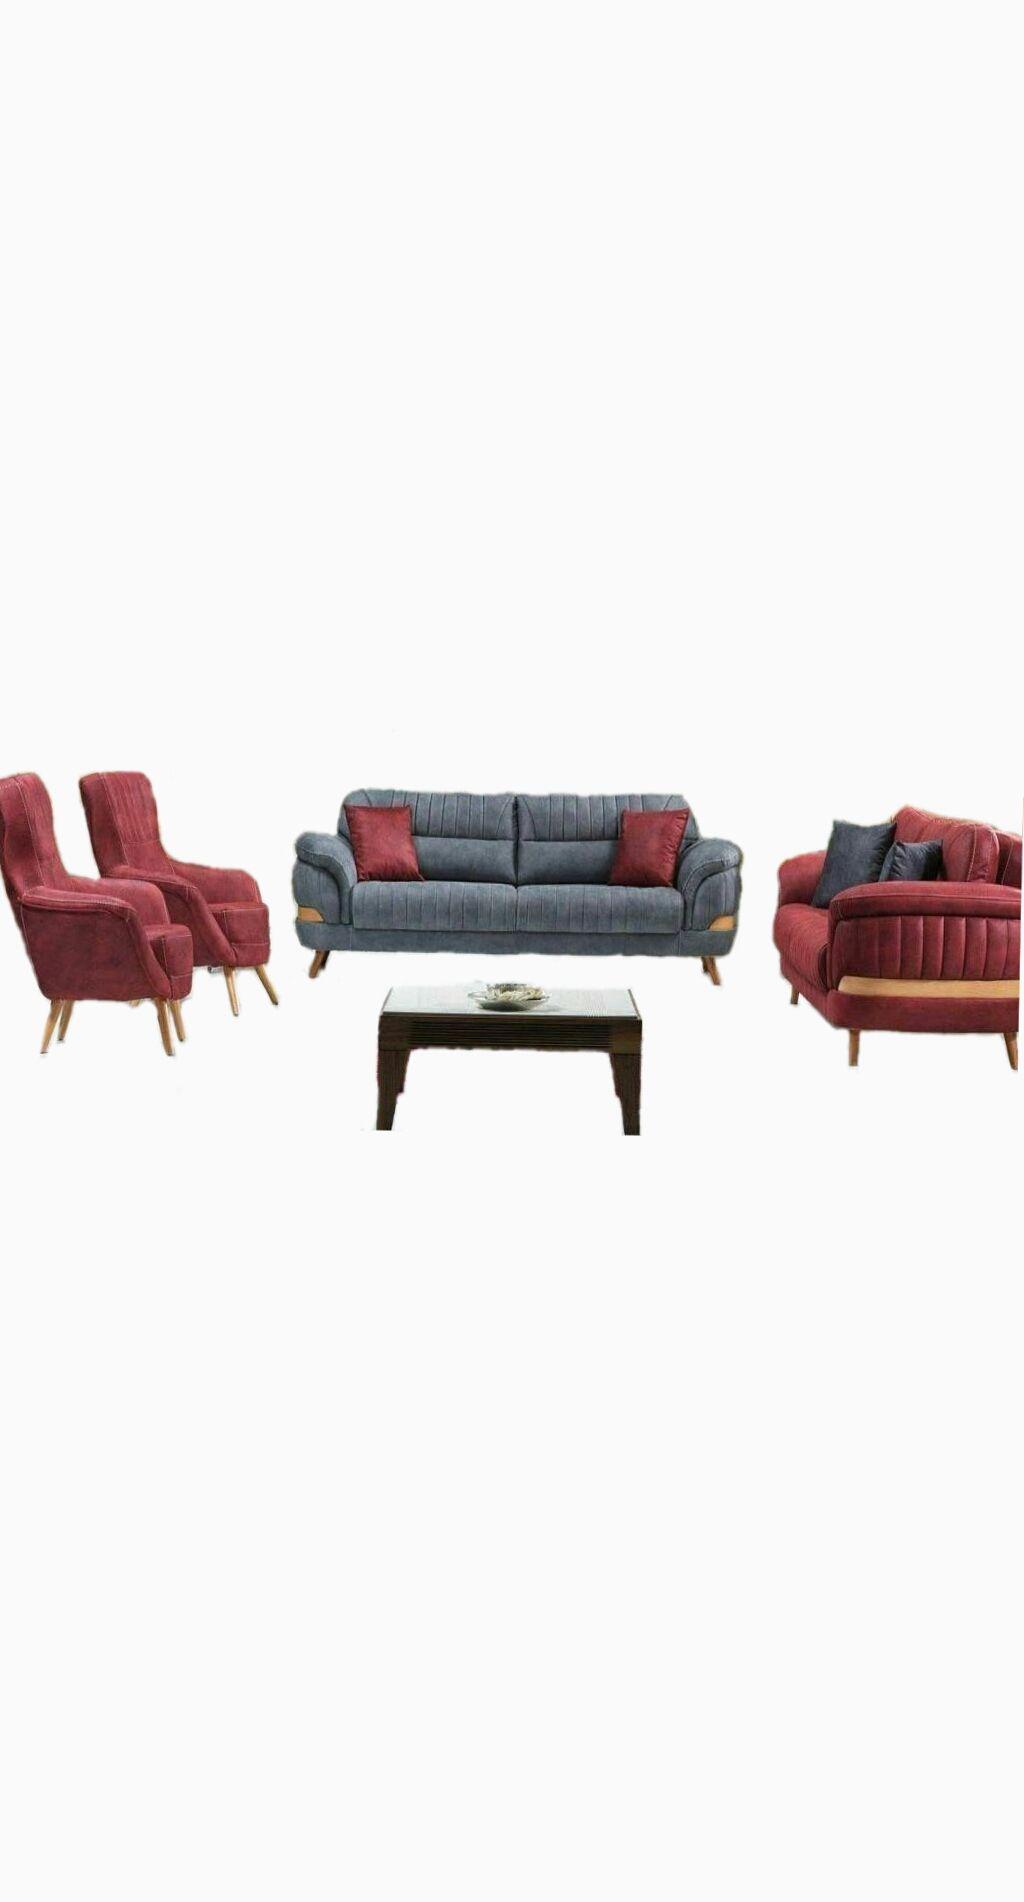 مبل راحتی مدل ۸۳ هایپر مبل ایران ۰۲۱۶۶۰۰۸۰۱۲ Hyper Moble Iran Outdoor Sofa Eames Lounge Chair Eames Lounge